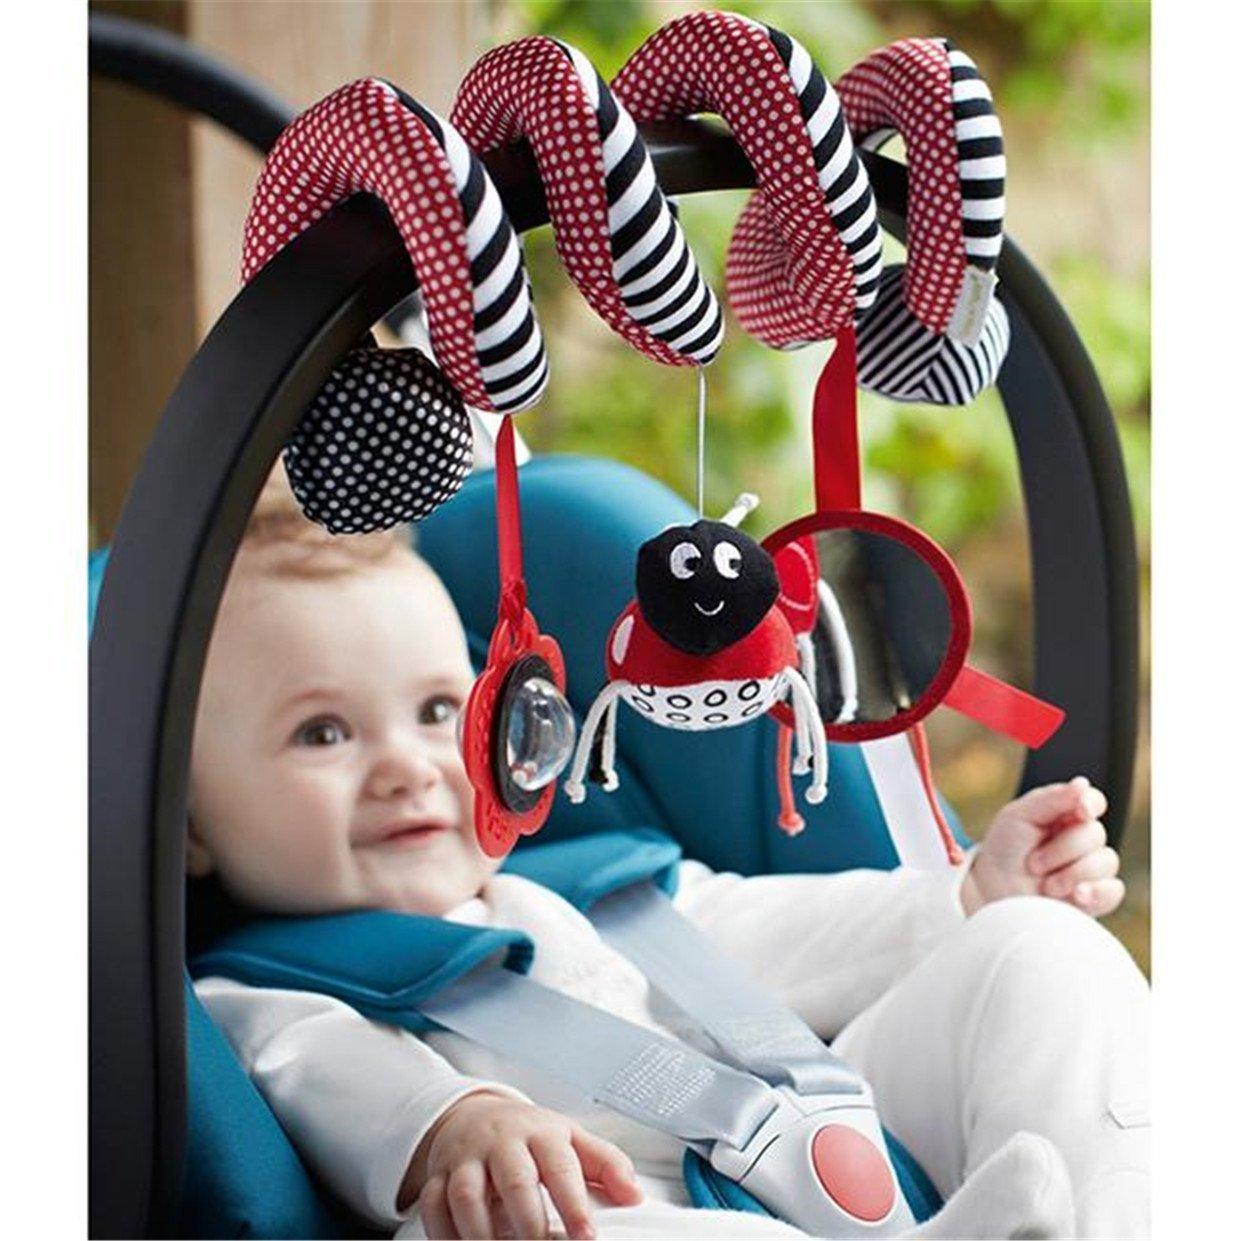 TININNA Colgar Juguetes para Bebé Infantil,Bebé de Juguetes Espiral Cama Cochecito Juguete de Kids Sonajero Toys #2: Amazon.es: Hogar